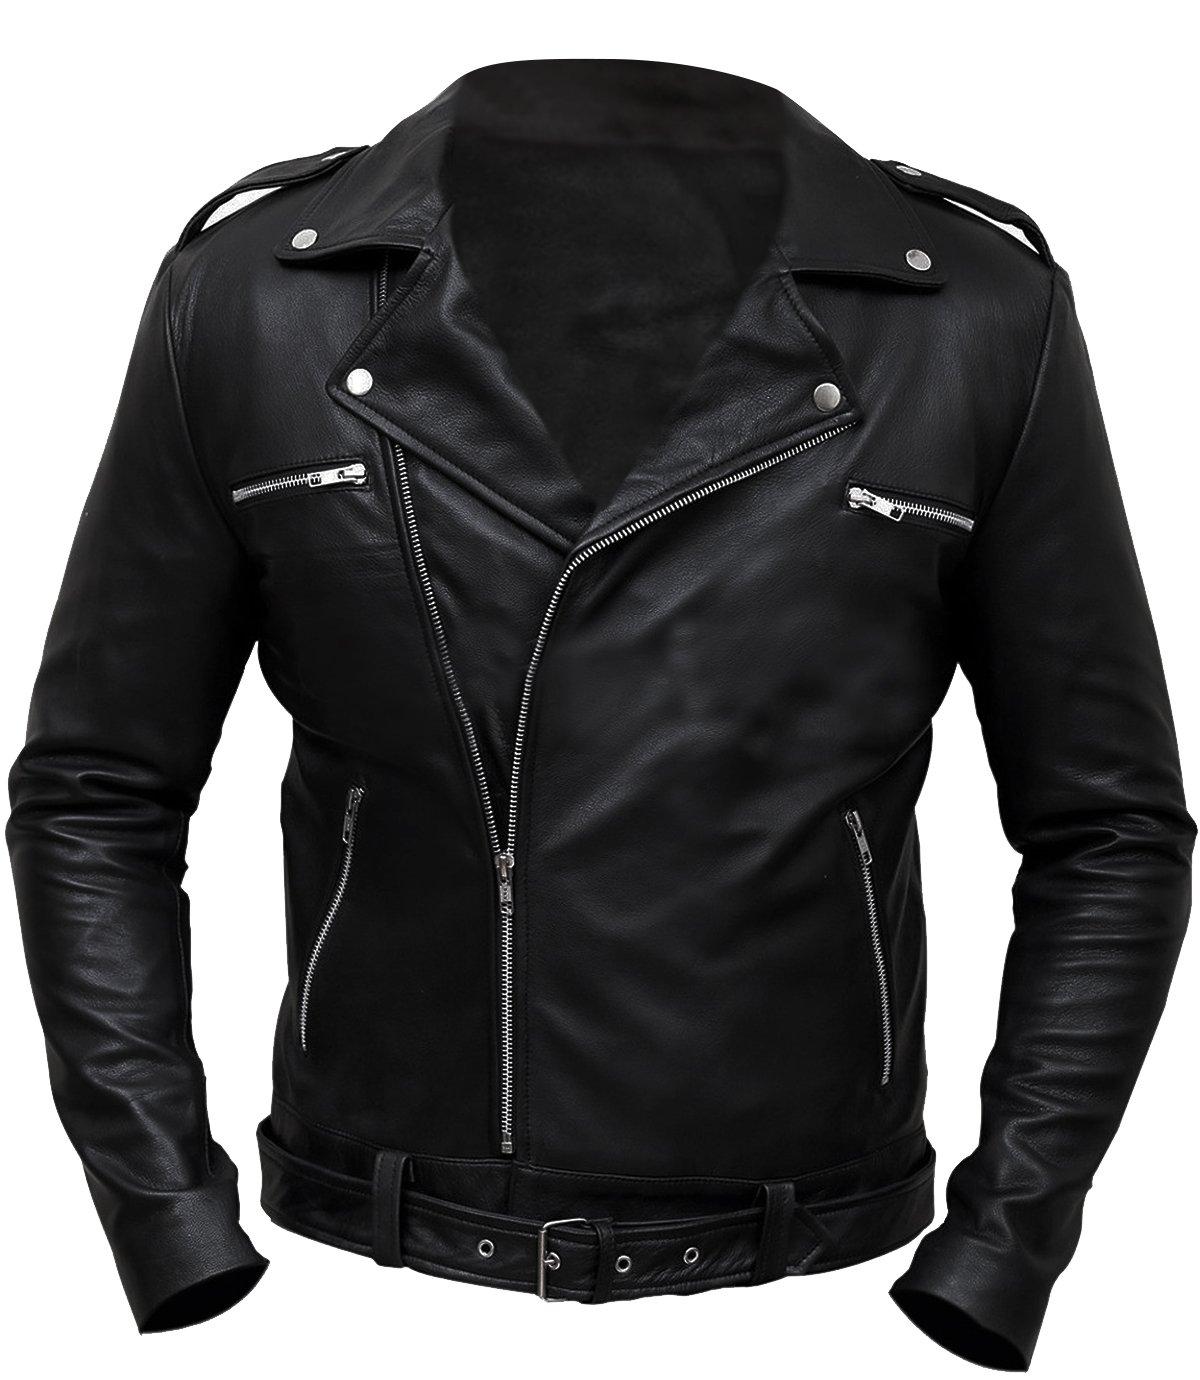 CHICAGO-FASHIONS Negan Jacket Walking Dead S7 Jeffrey Dean Morgan Black Biker Leather Jacket